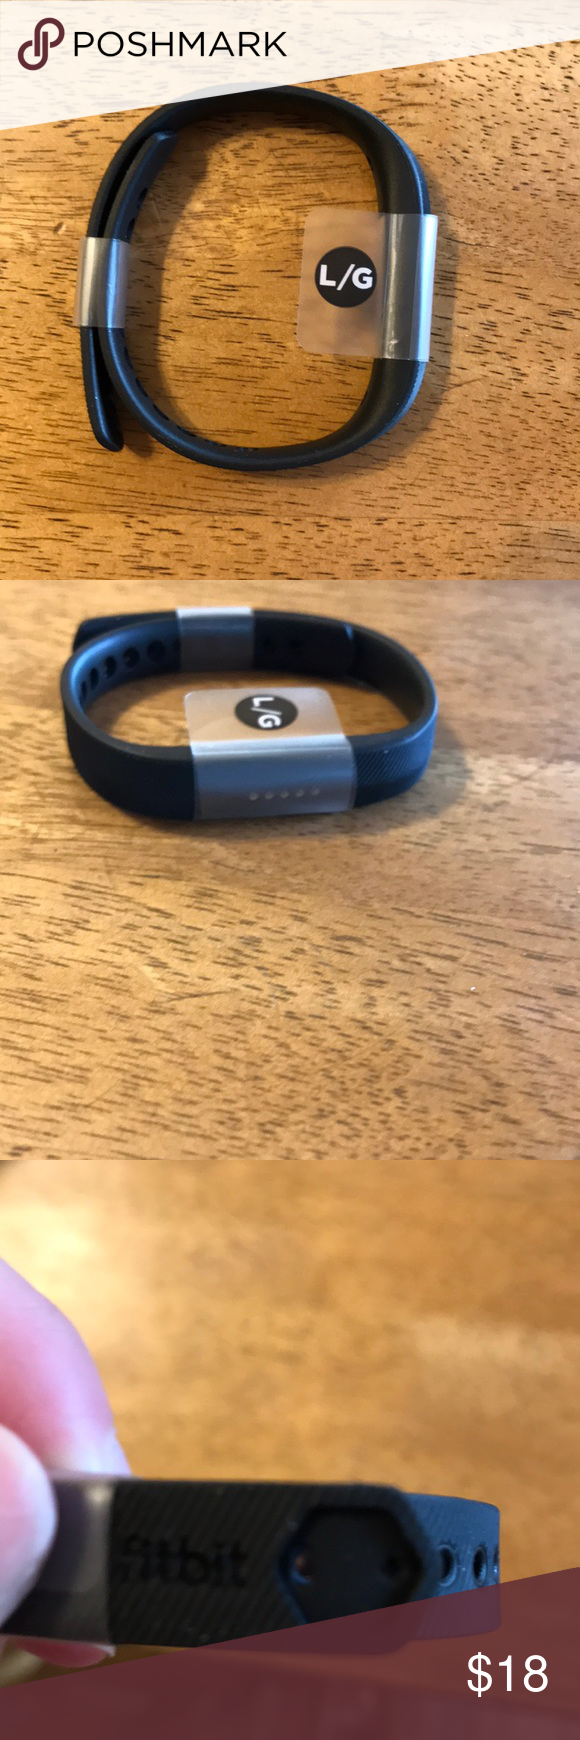 d121d23ce4afa Fitbit Flex 2 wrist band NWOT